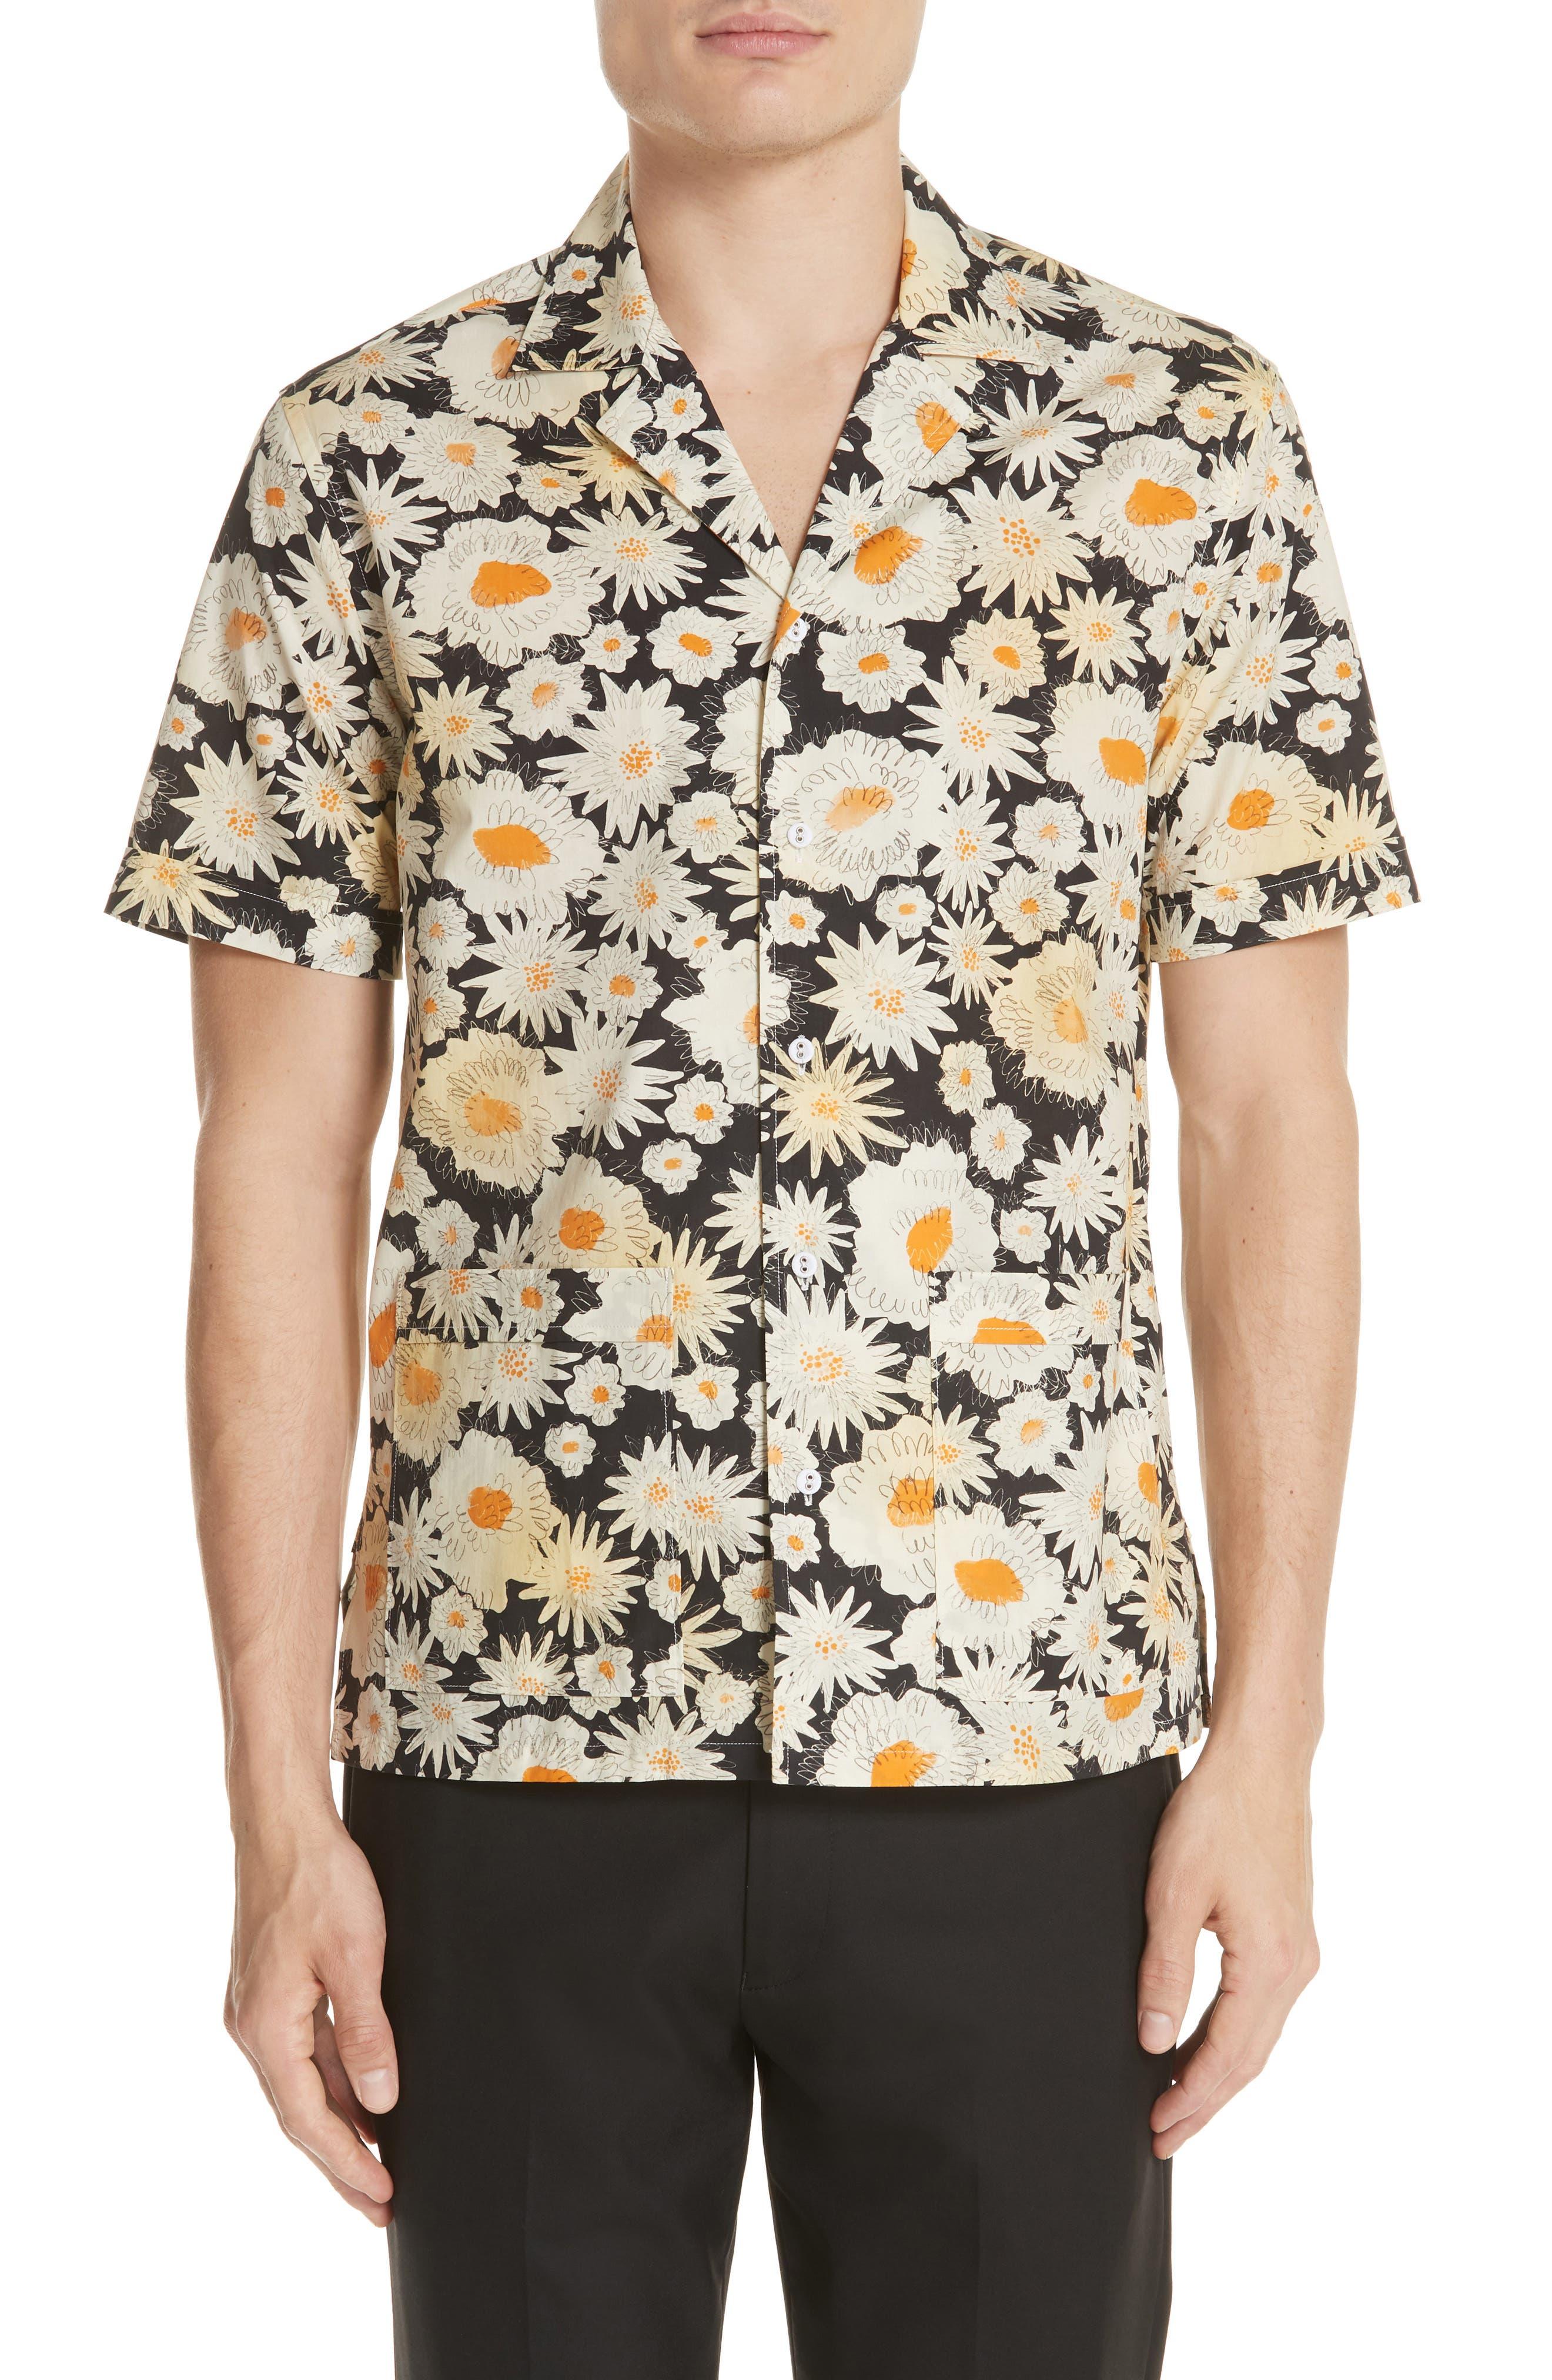 Jude Floral Print Shirt,                         Main,                         color, 001